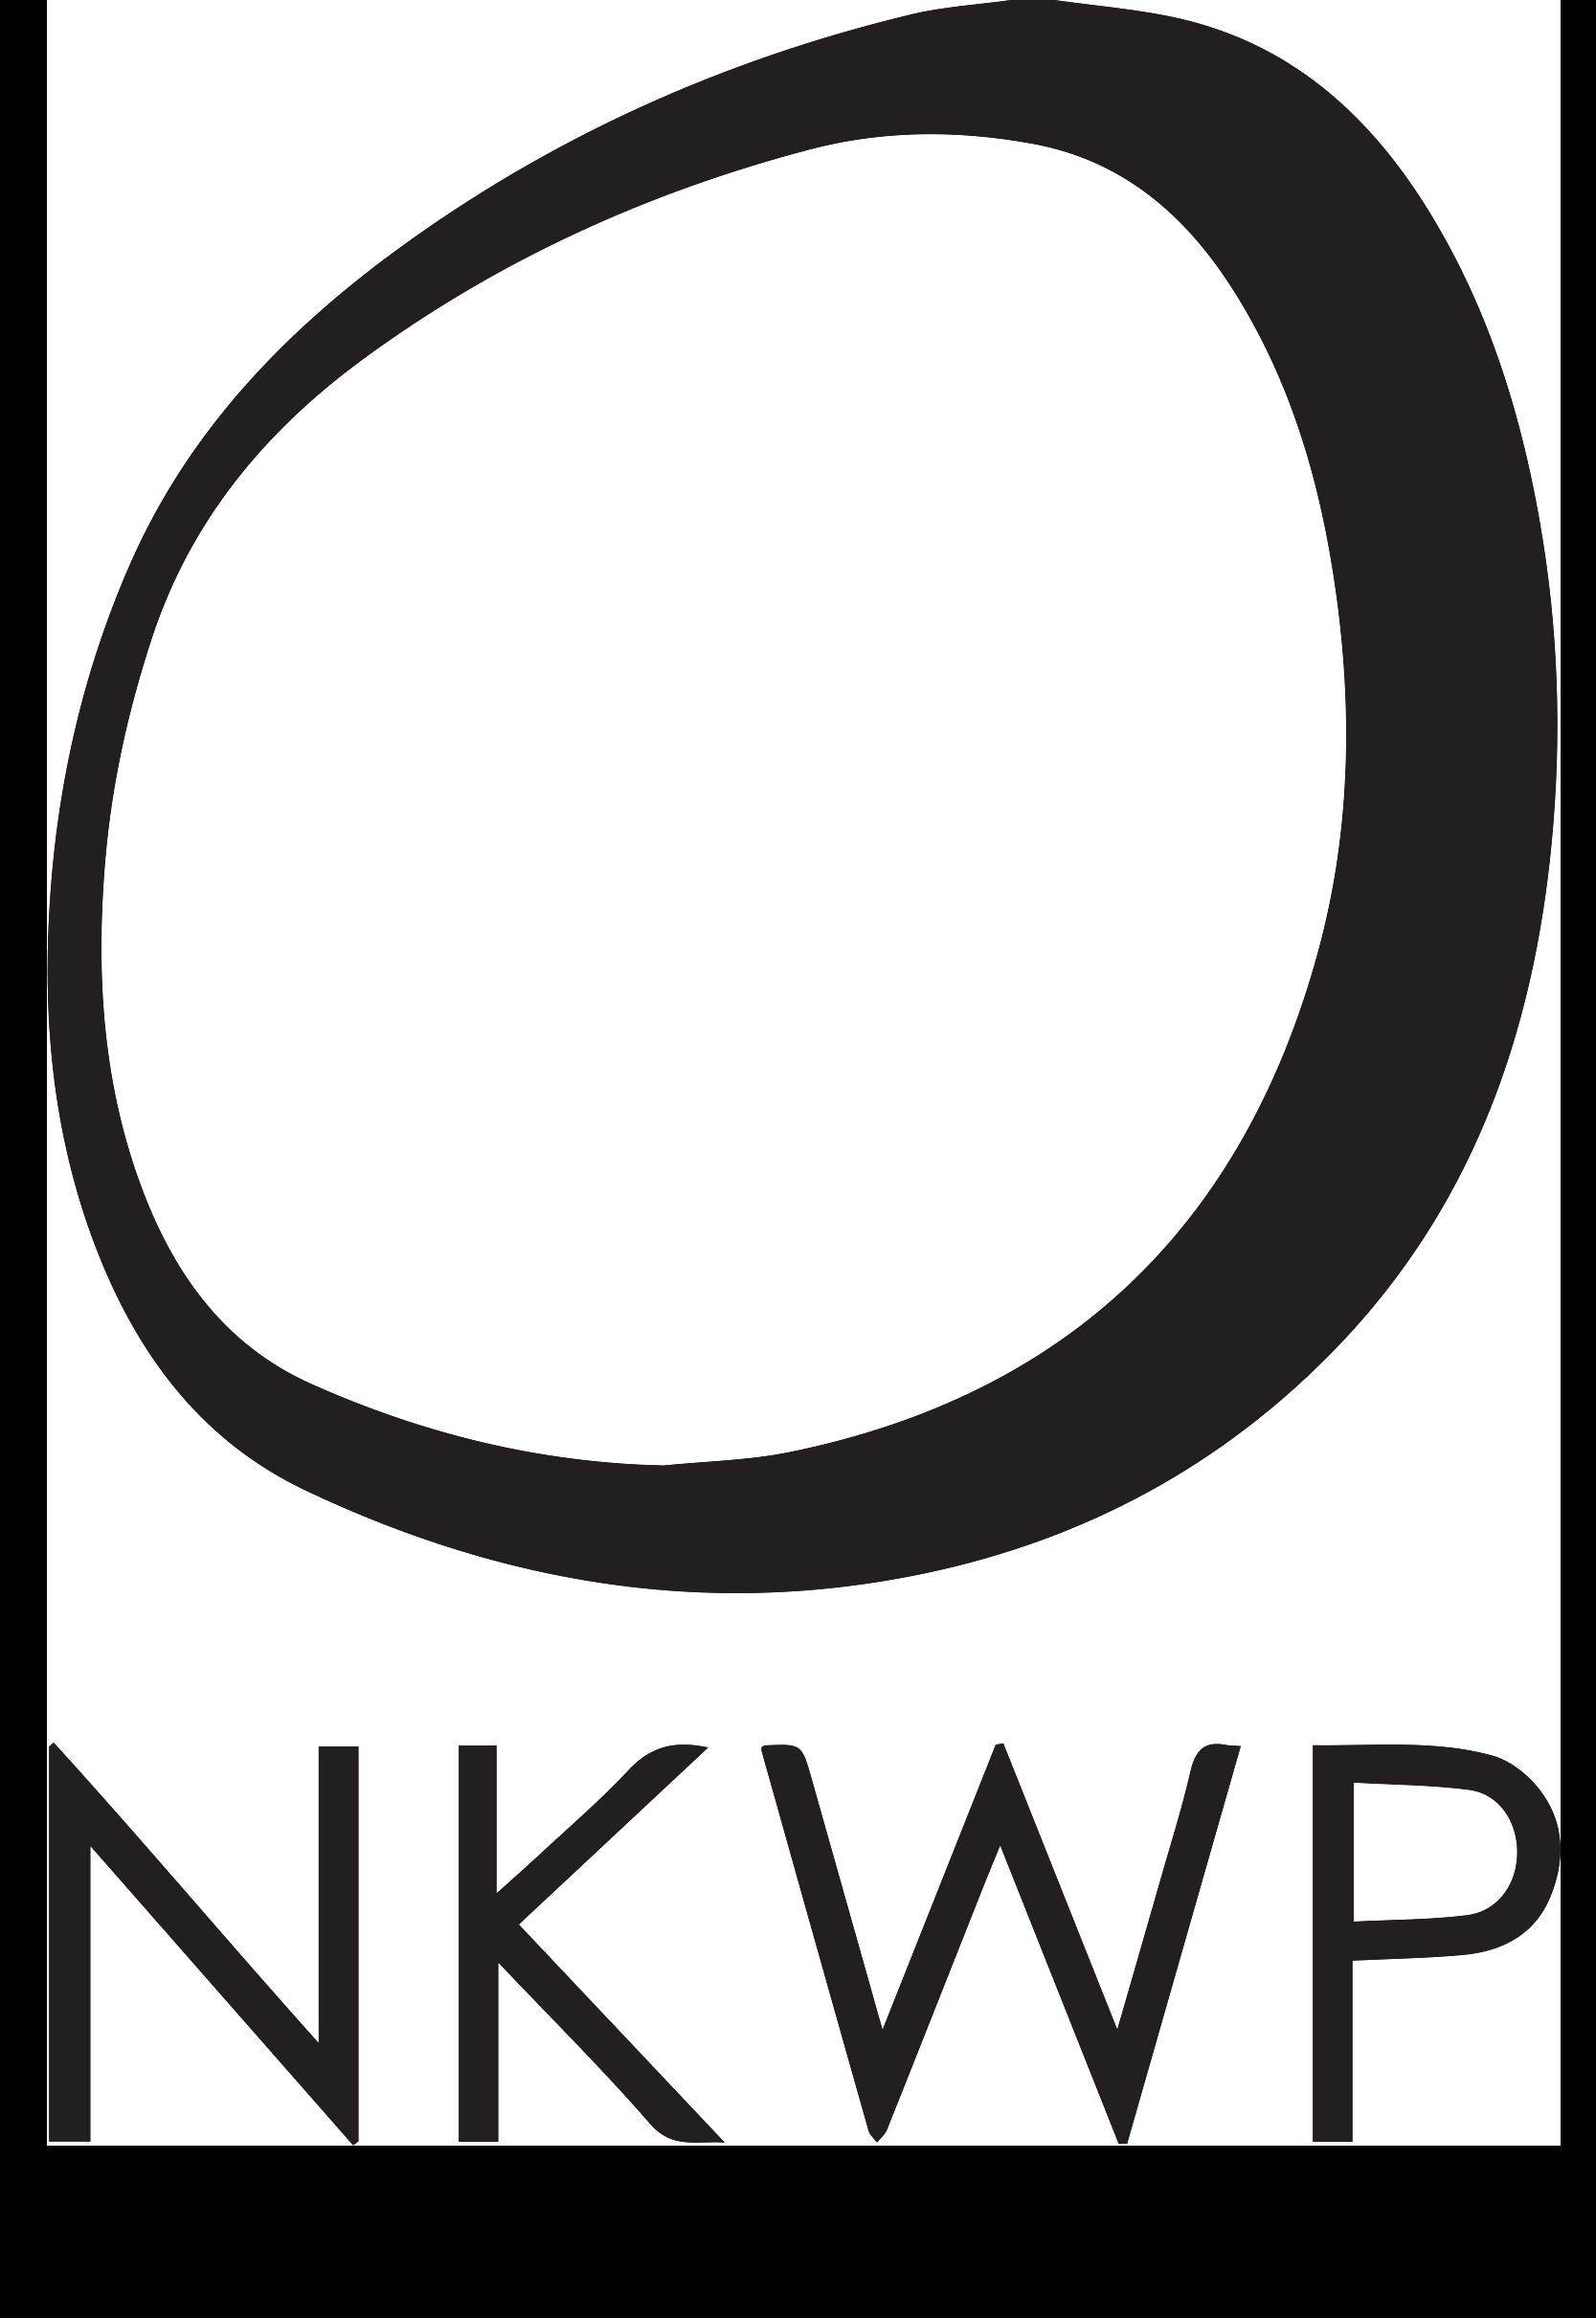 nkwp-logo-nobackground